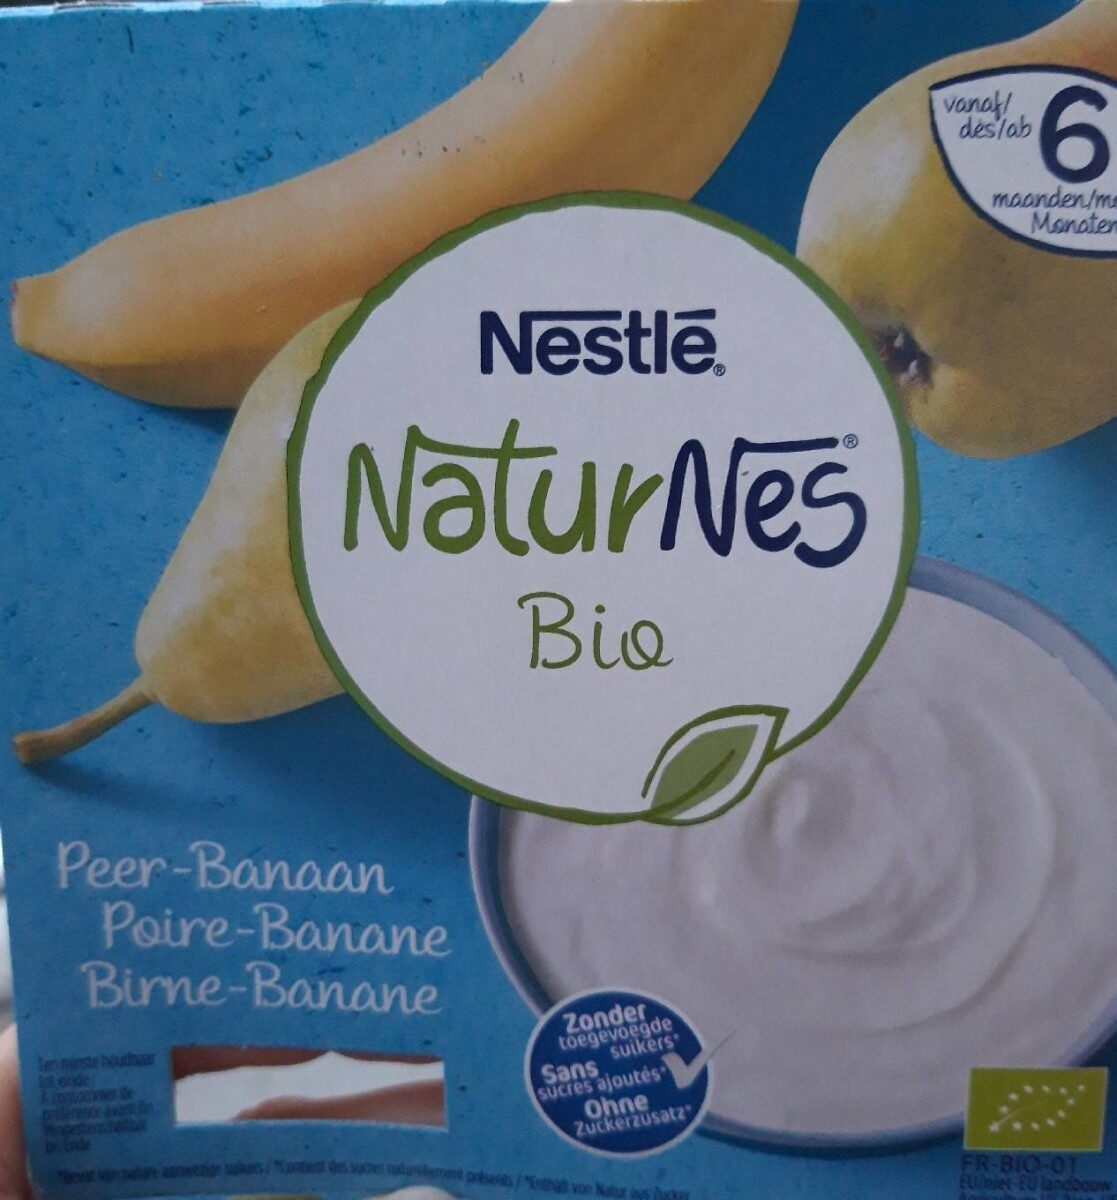 Naturnes bio - Product - fr